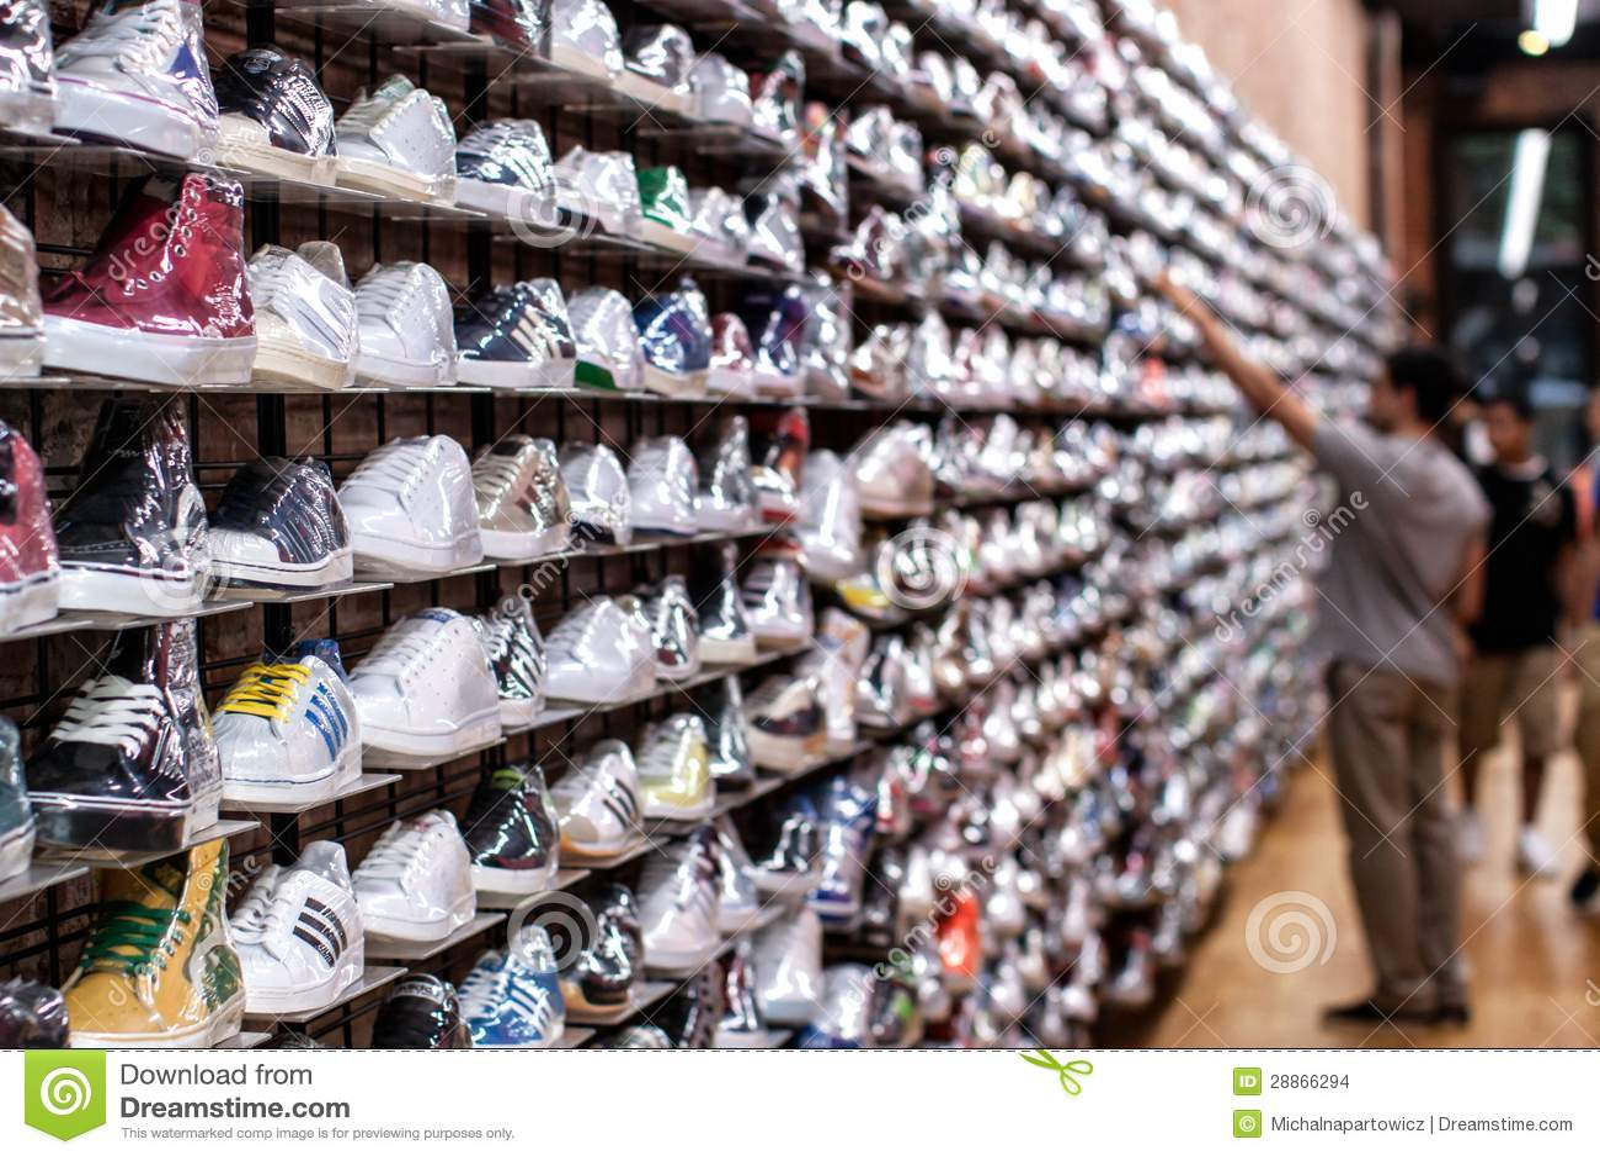 magasin de chaussures image stock ditorial image 28866294. Black Bedroom Furniture Sets. Home Design Ideas